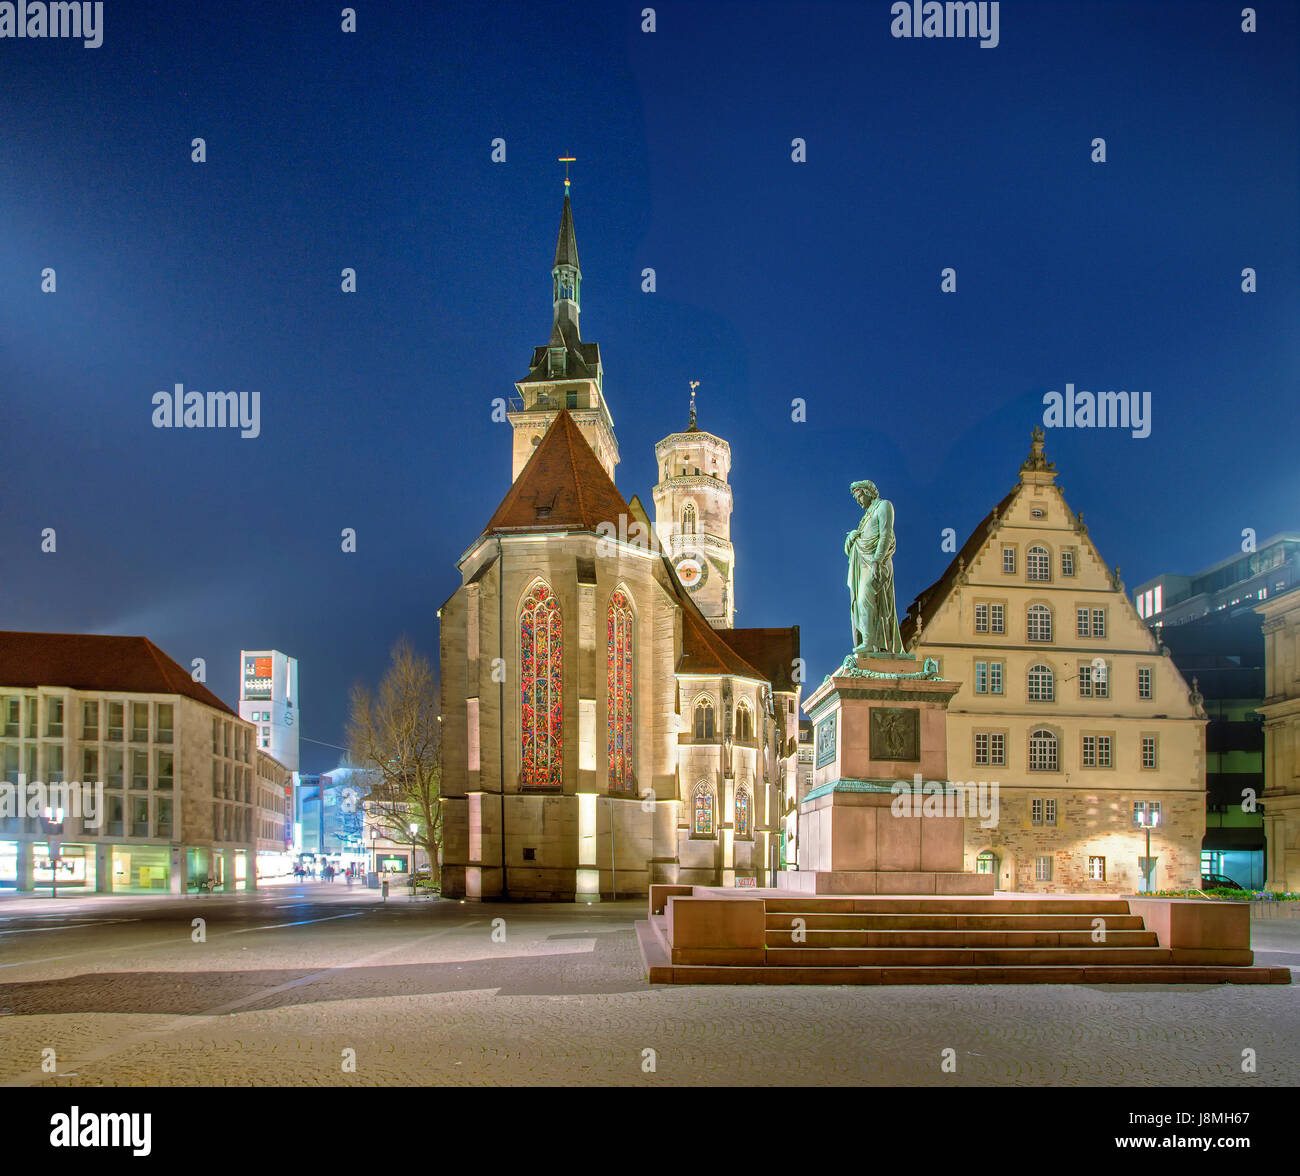 Schillerplatz Stuttgart, Panorama Photo. Old Castle, Town Hall Tower, Stiftskirche, Schillerdenkmal. - Stock Image